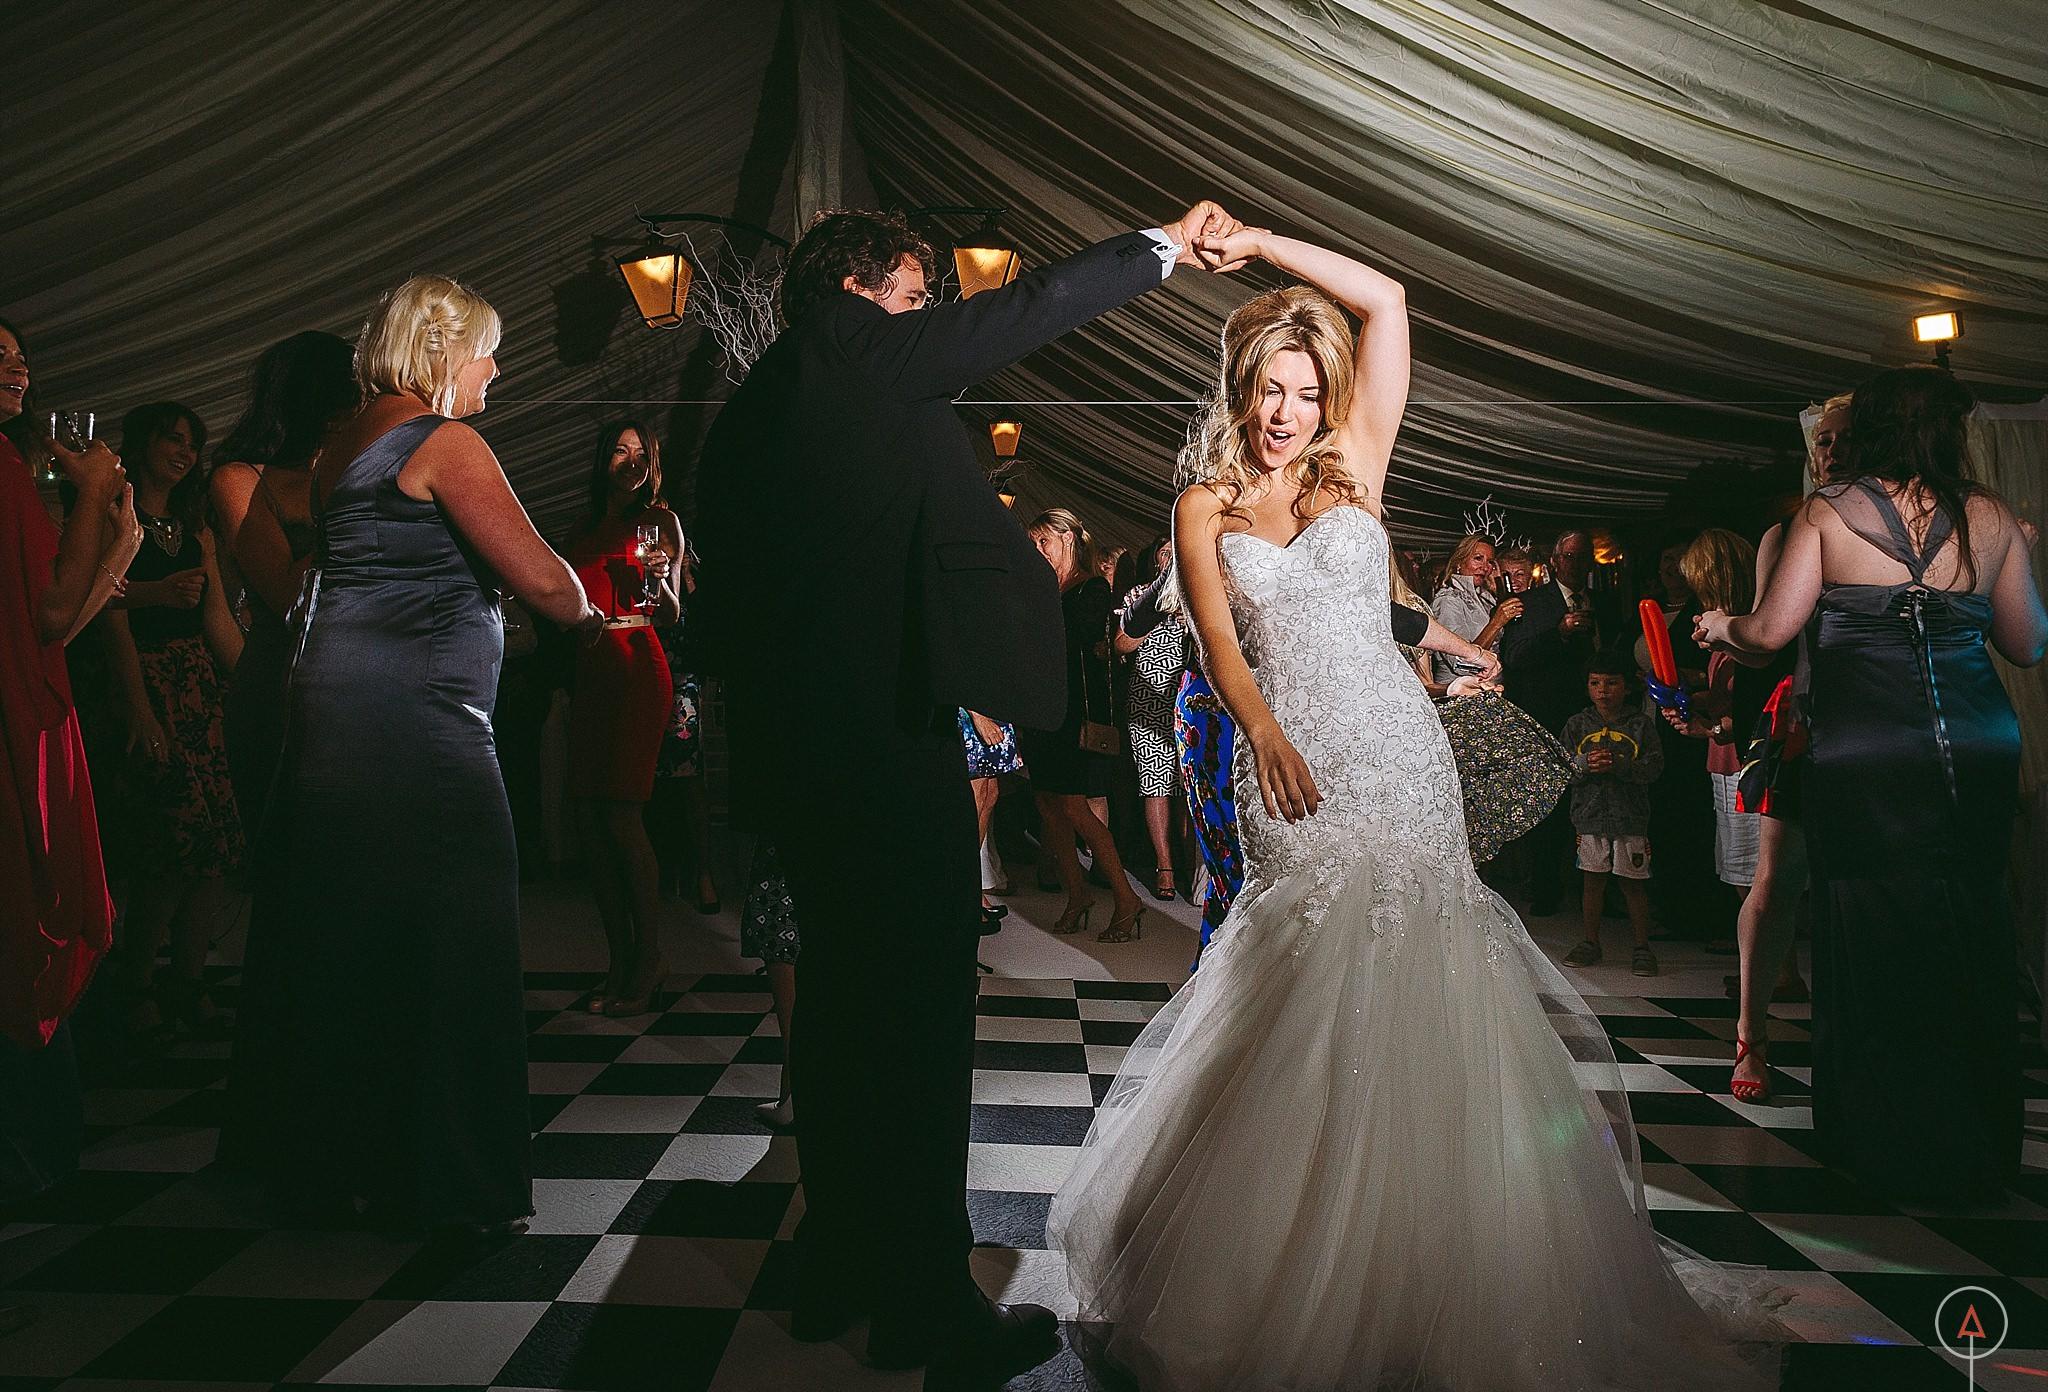 cardiff-wedding-photographer-aga-tomaszek_0412